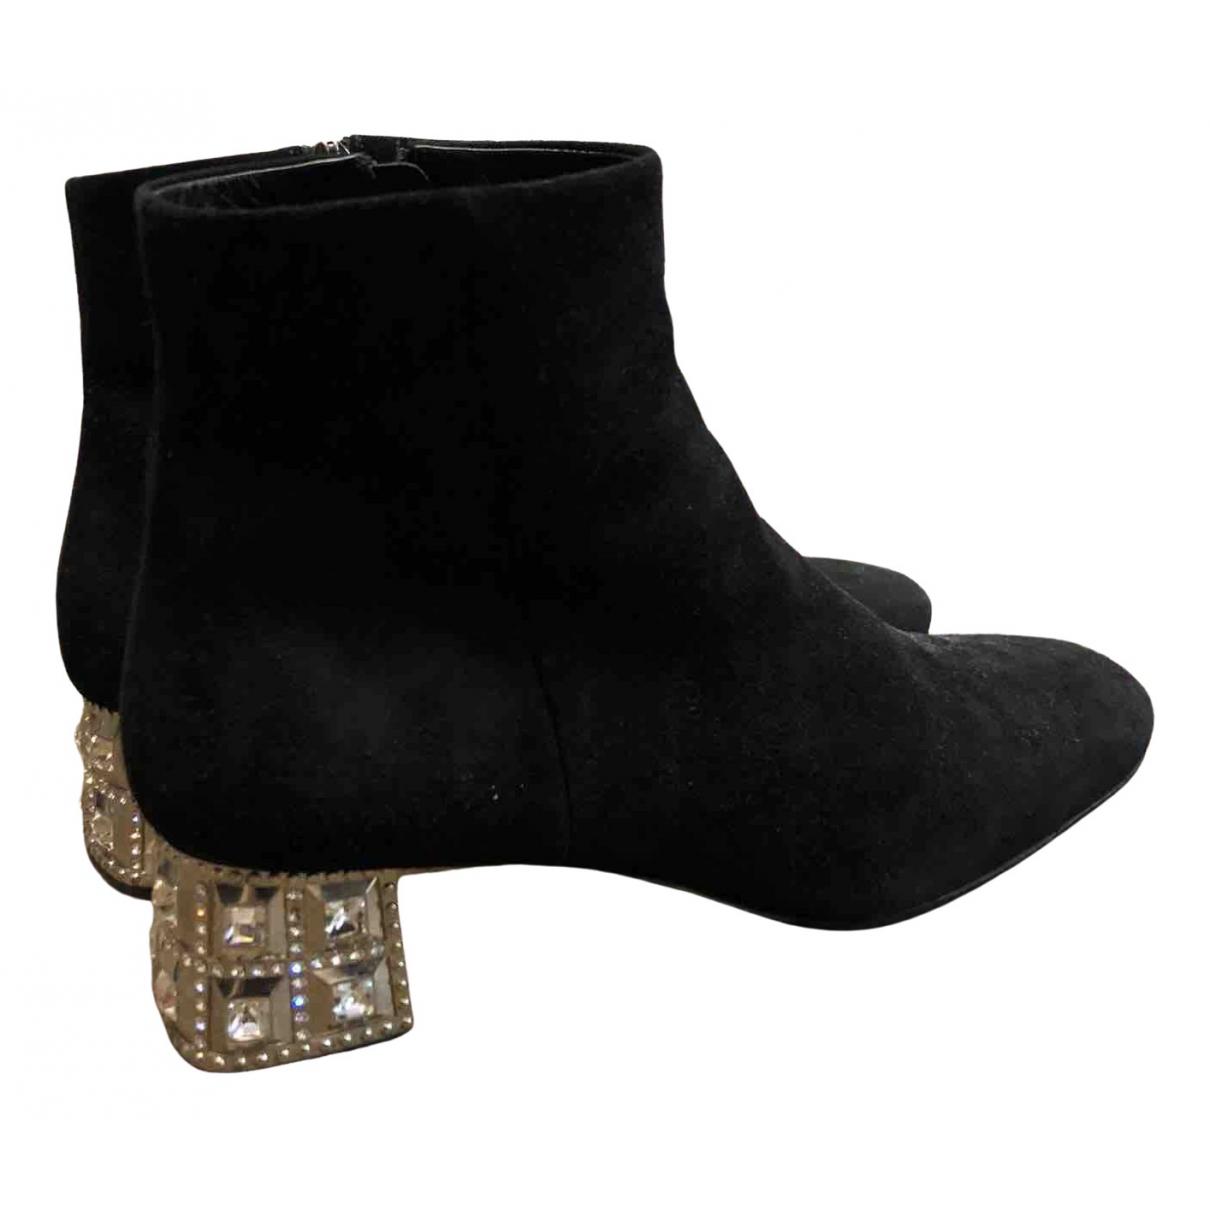 Miu Miu \N Black Suede Ankle boots for Women 38.5 EU